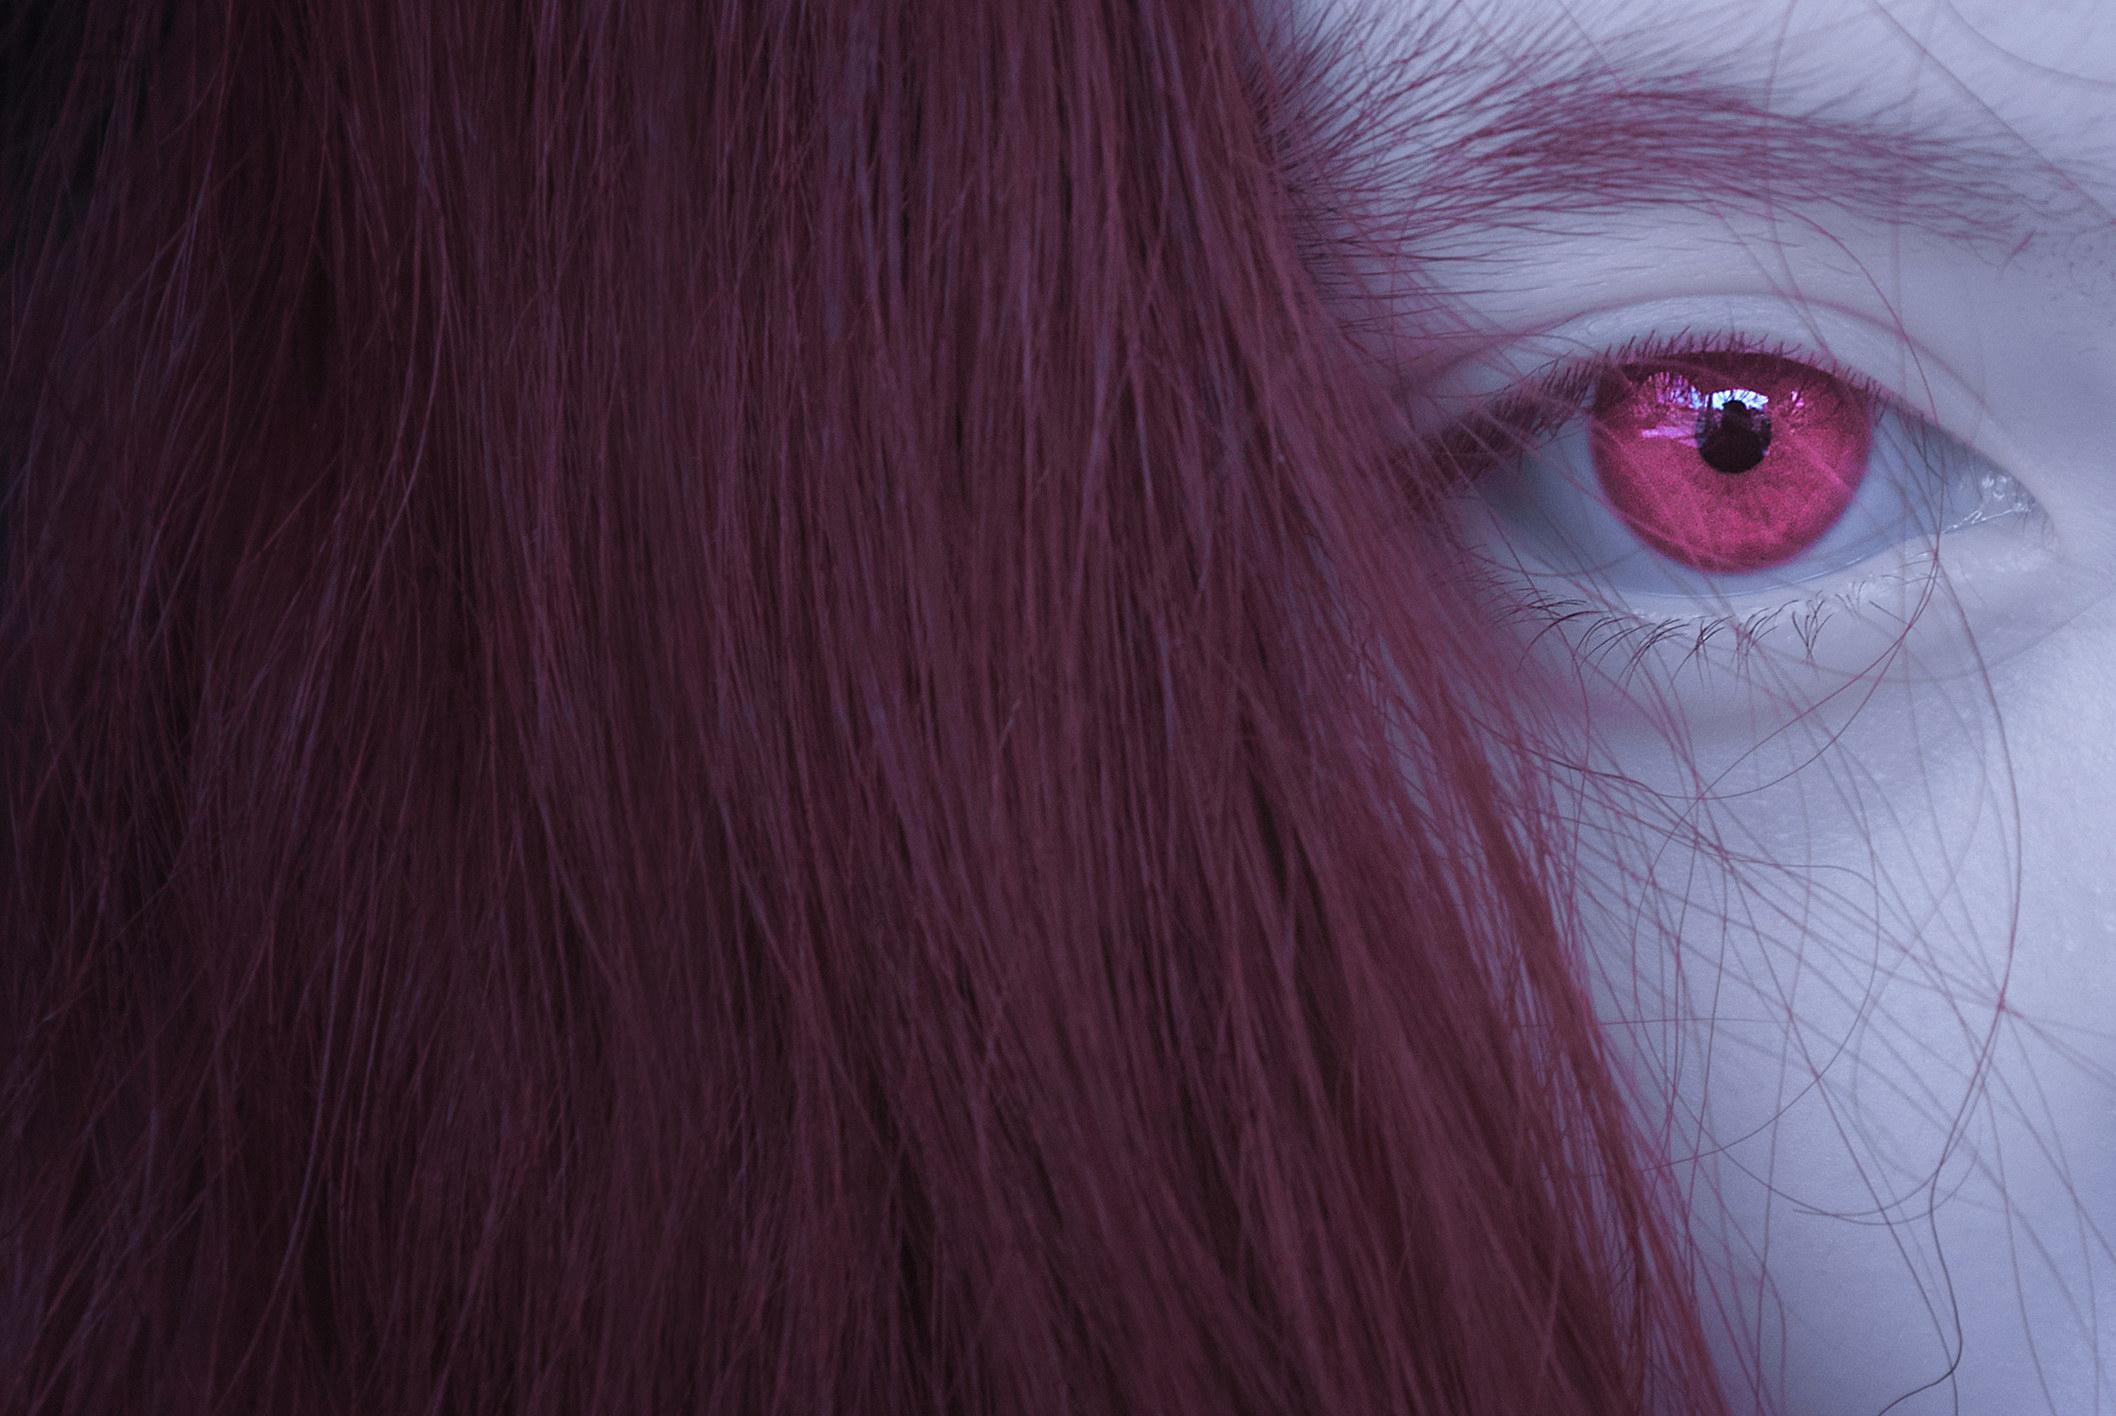 Girl with pink iris